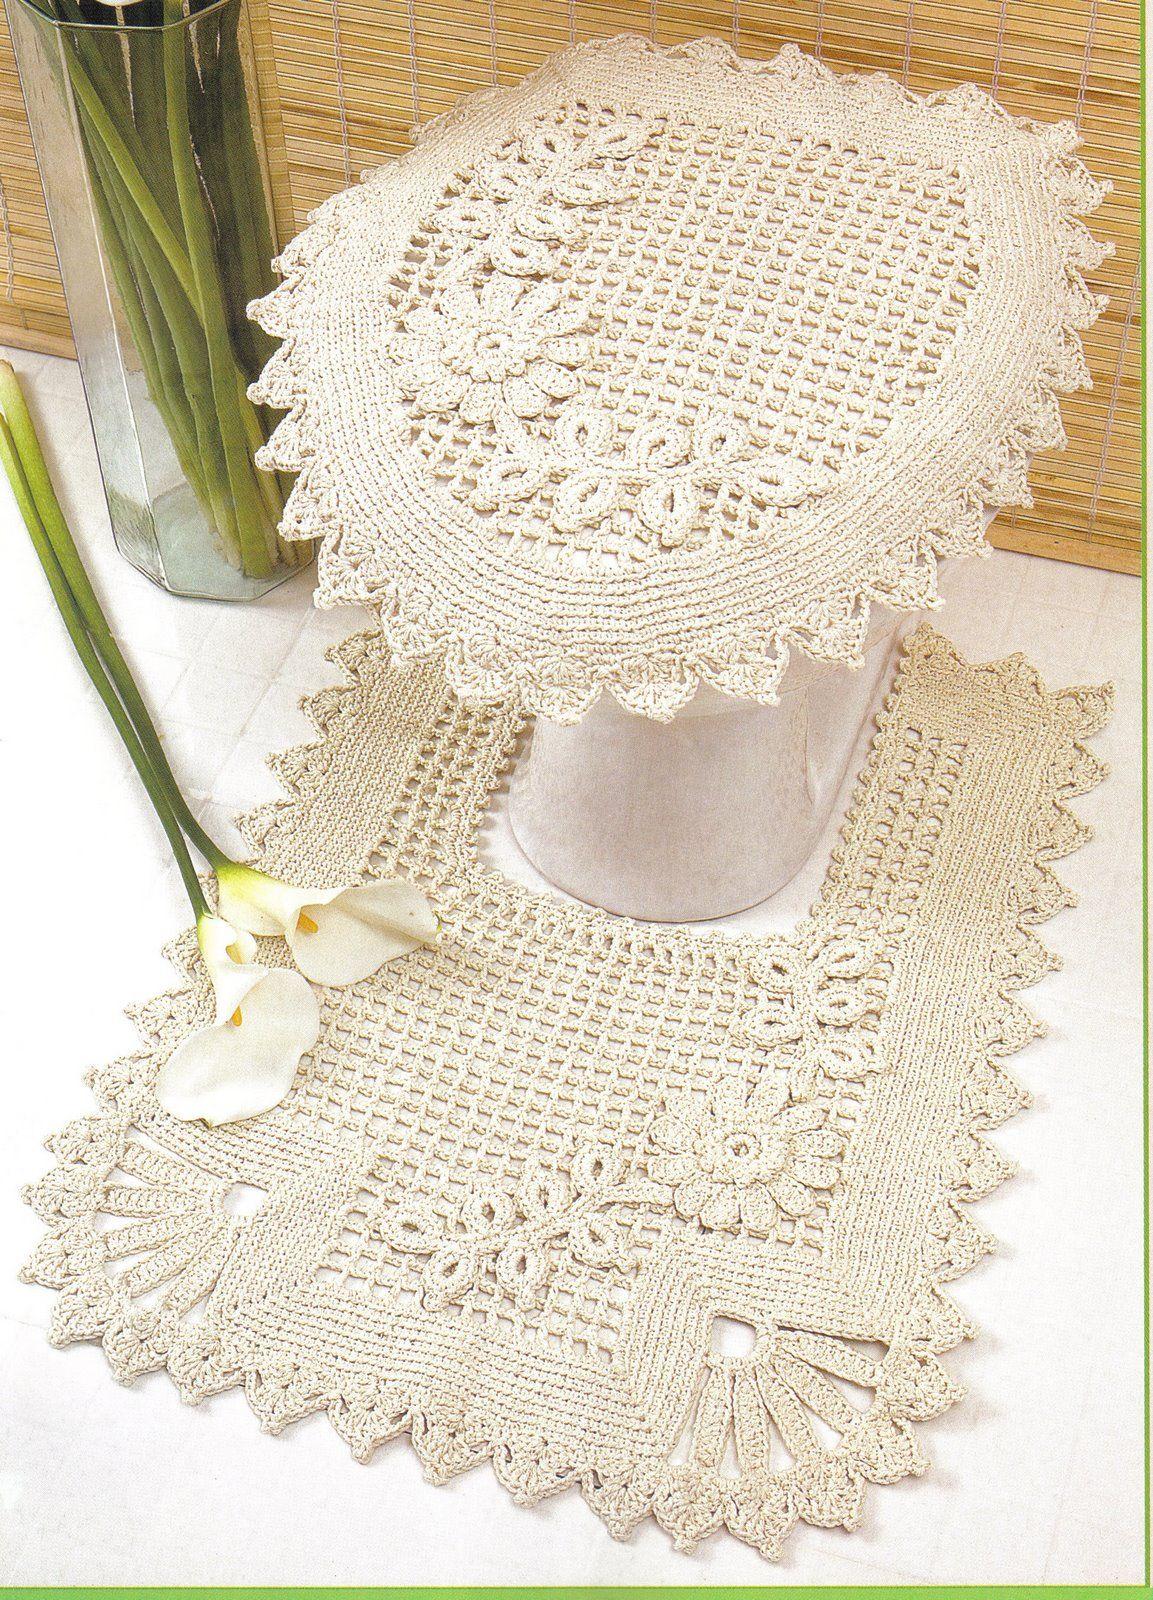 Crochet Thread Crochet Crochet Home Decor